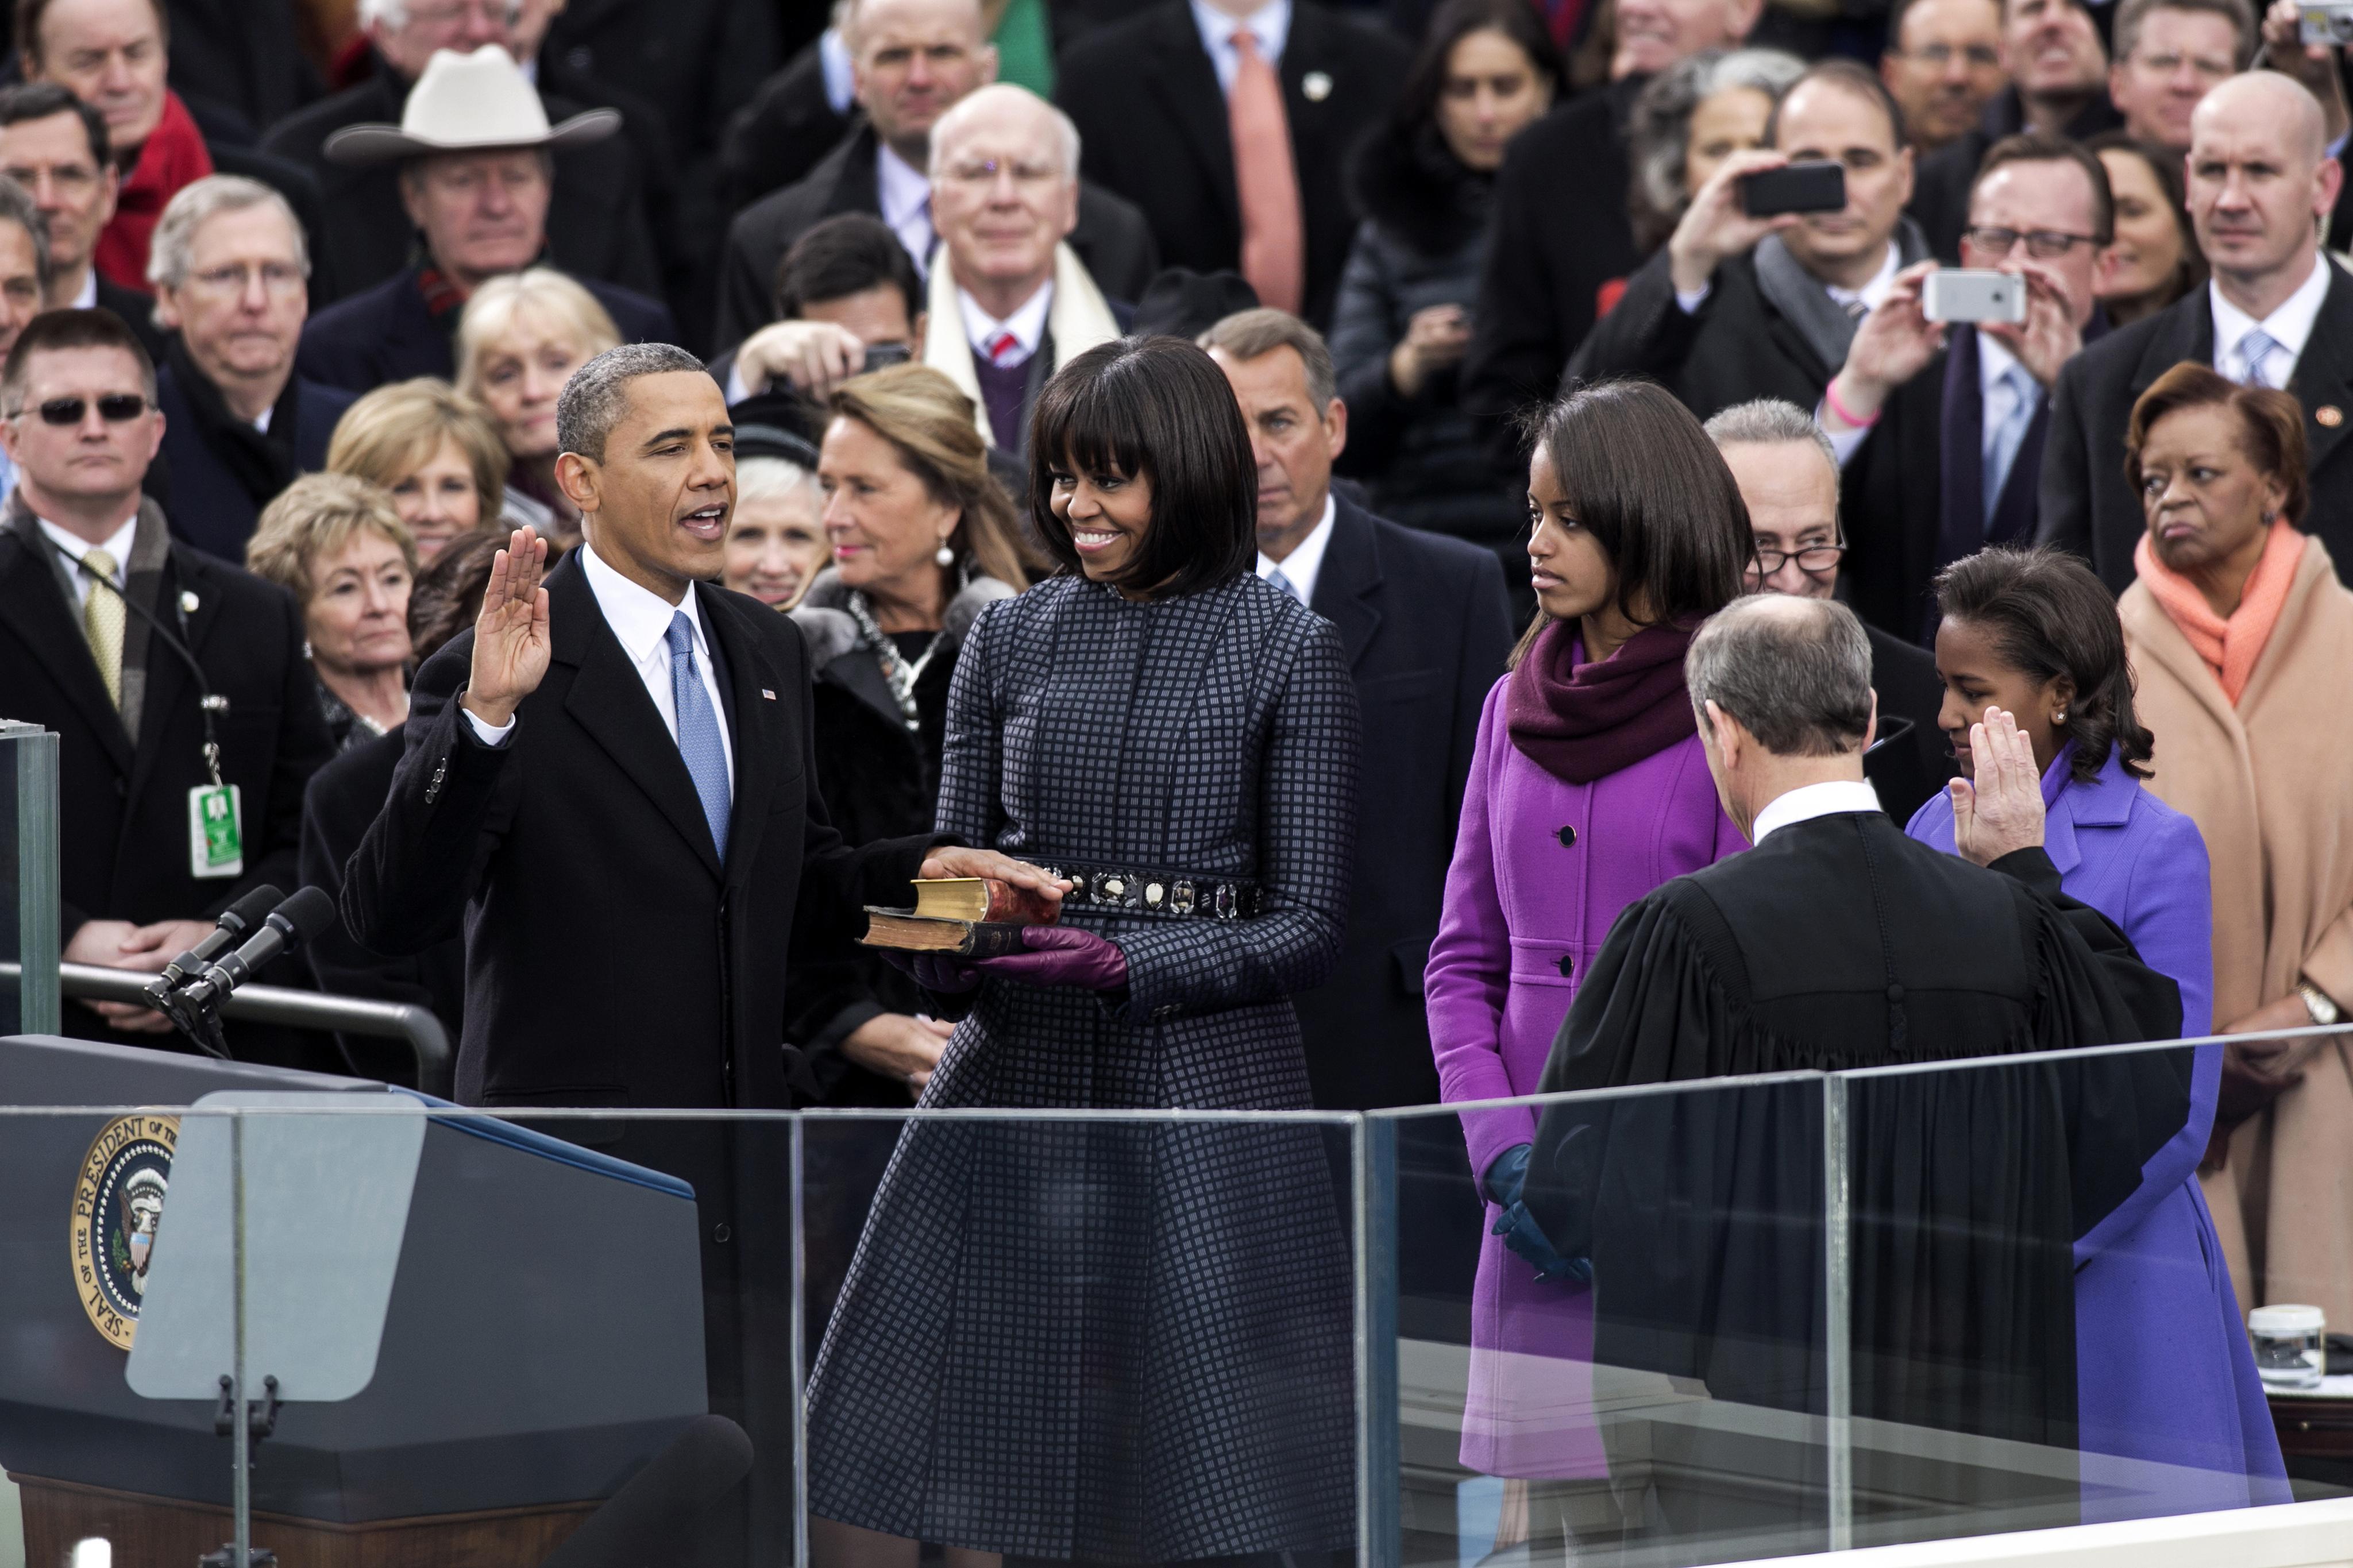 Barack Obama second swearing in ceremony 2013-01-21.jpg